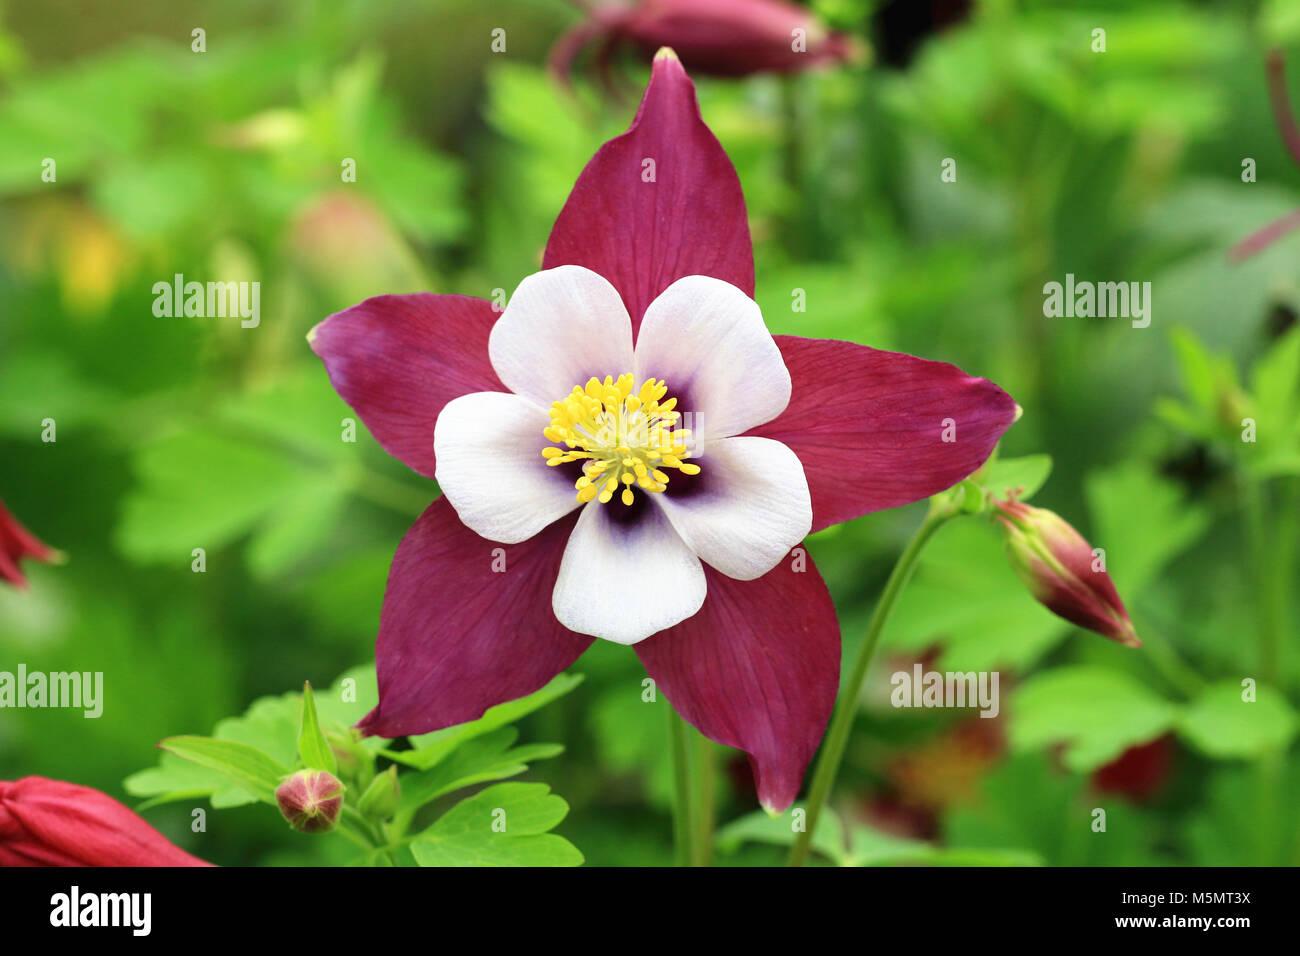 Fragrant columbine stock photos fragrant columbine stock images columbine flower and budscloseup of purple with white columbine flower in full bloom in izmirmasajfo